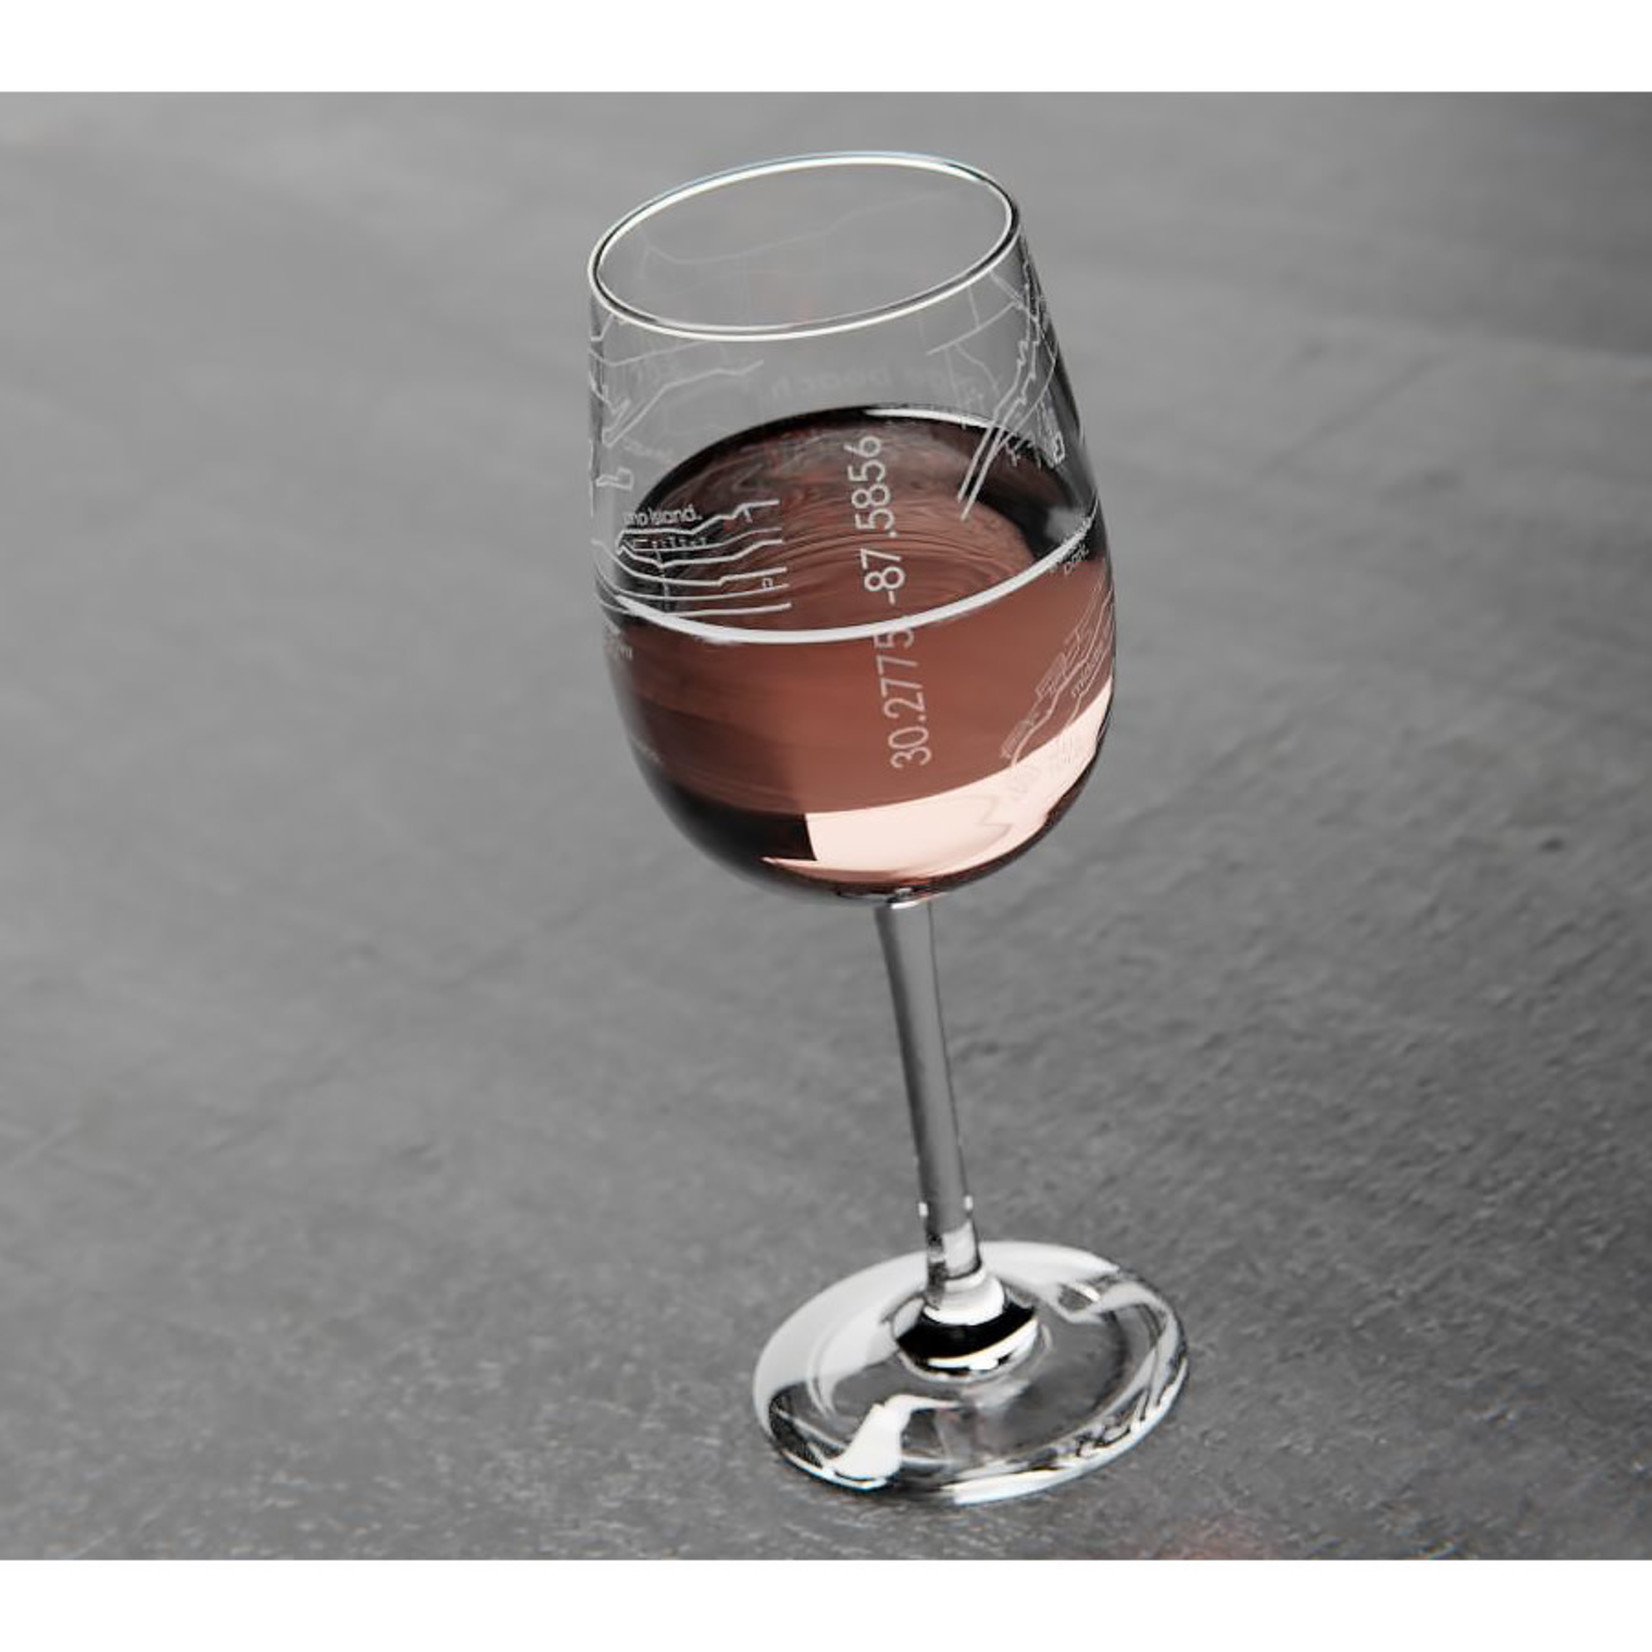 Well Told Orange Beach Map Wine Glass